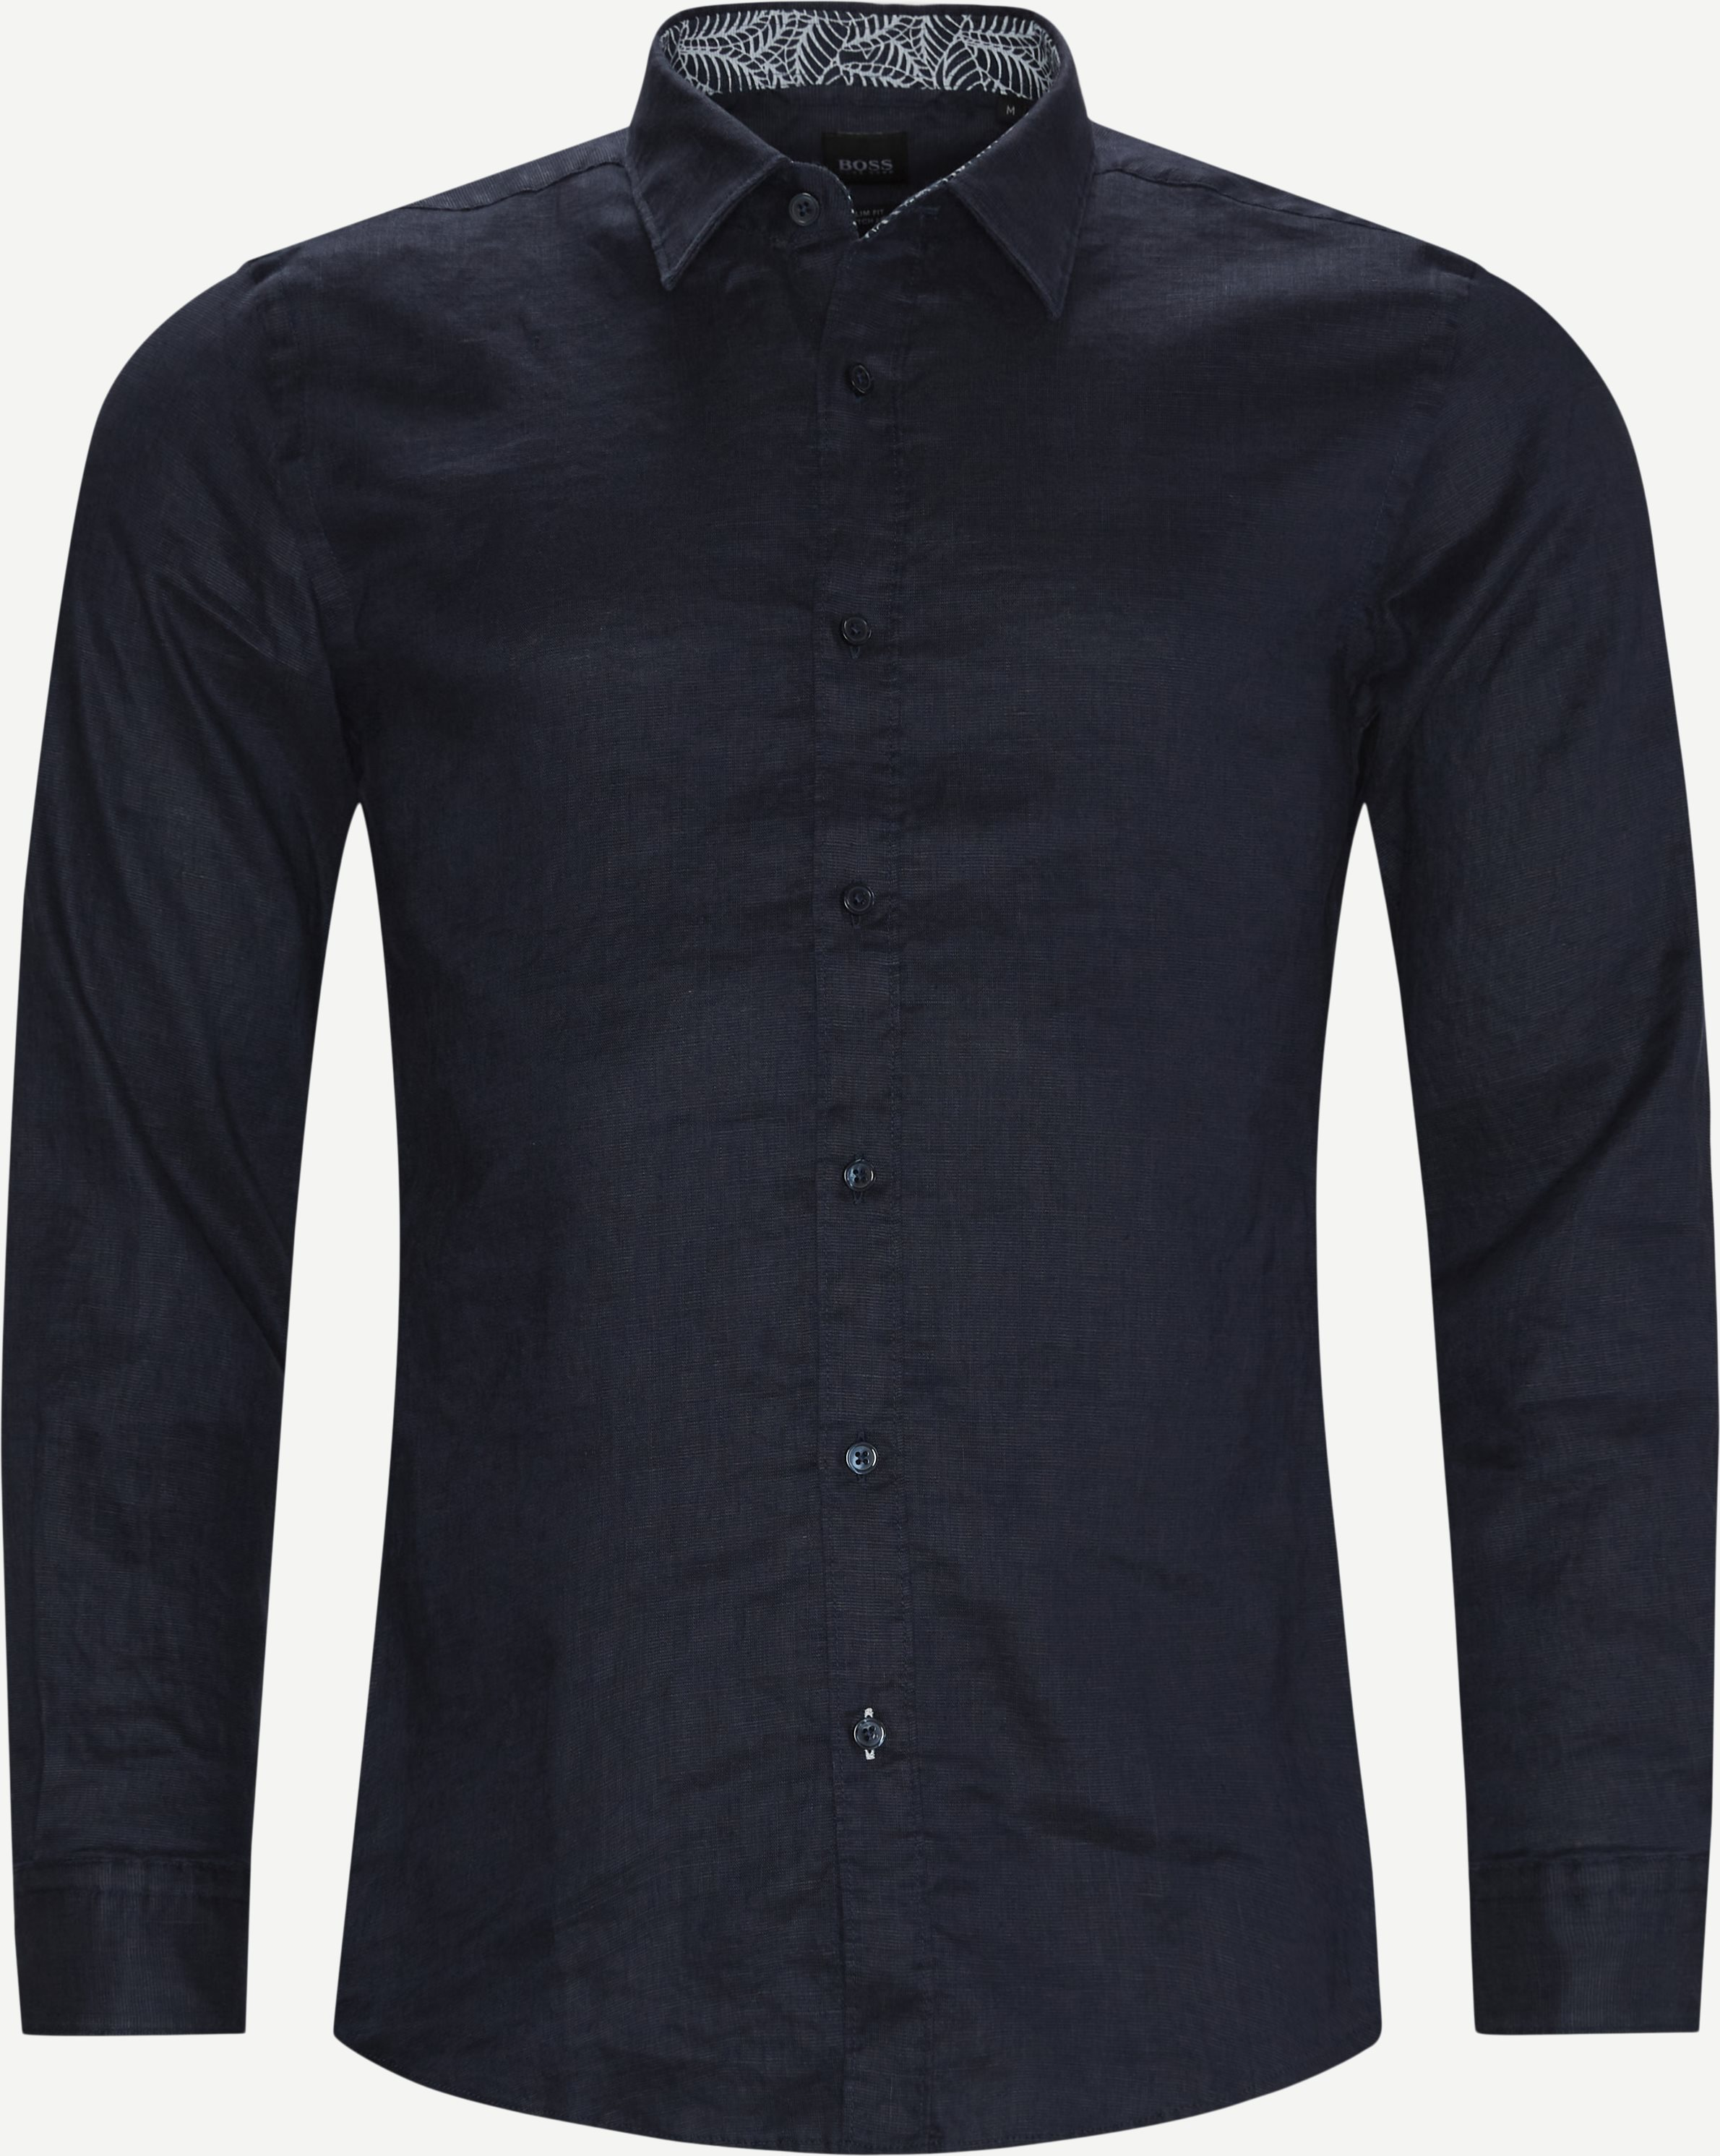 Ronni_53 Shirt - Skjortor - Slim - Blå